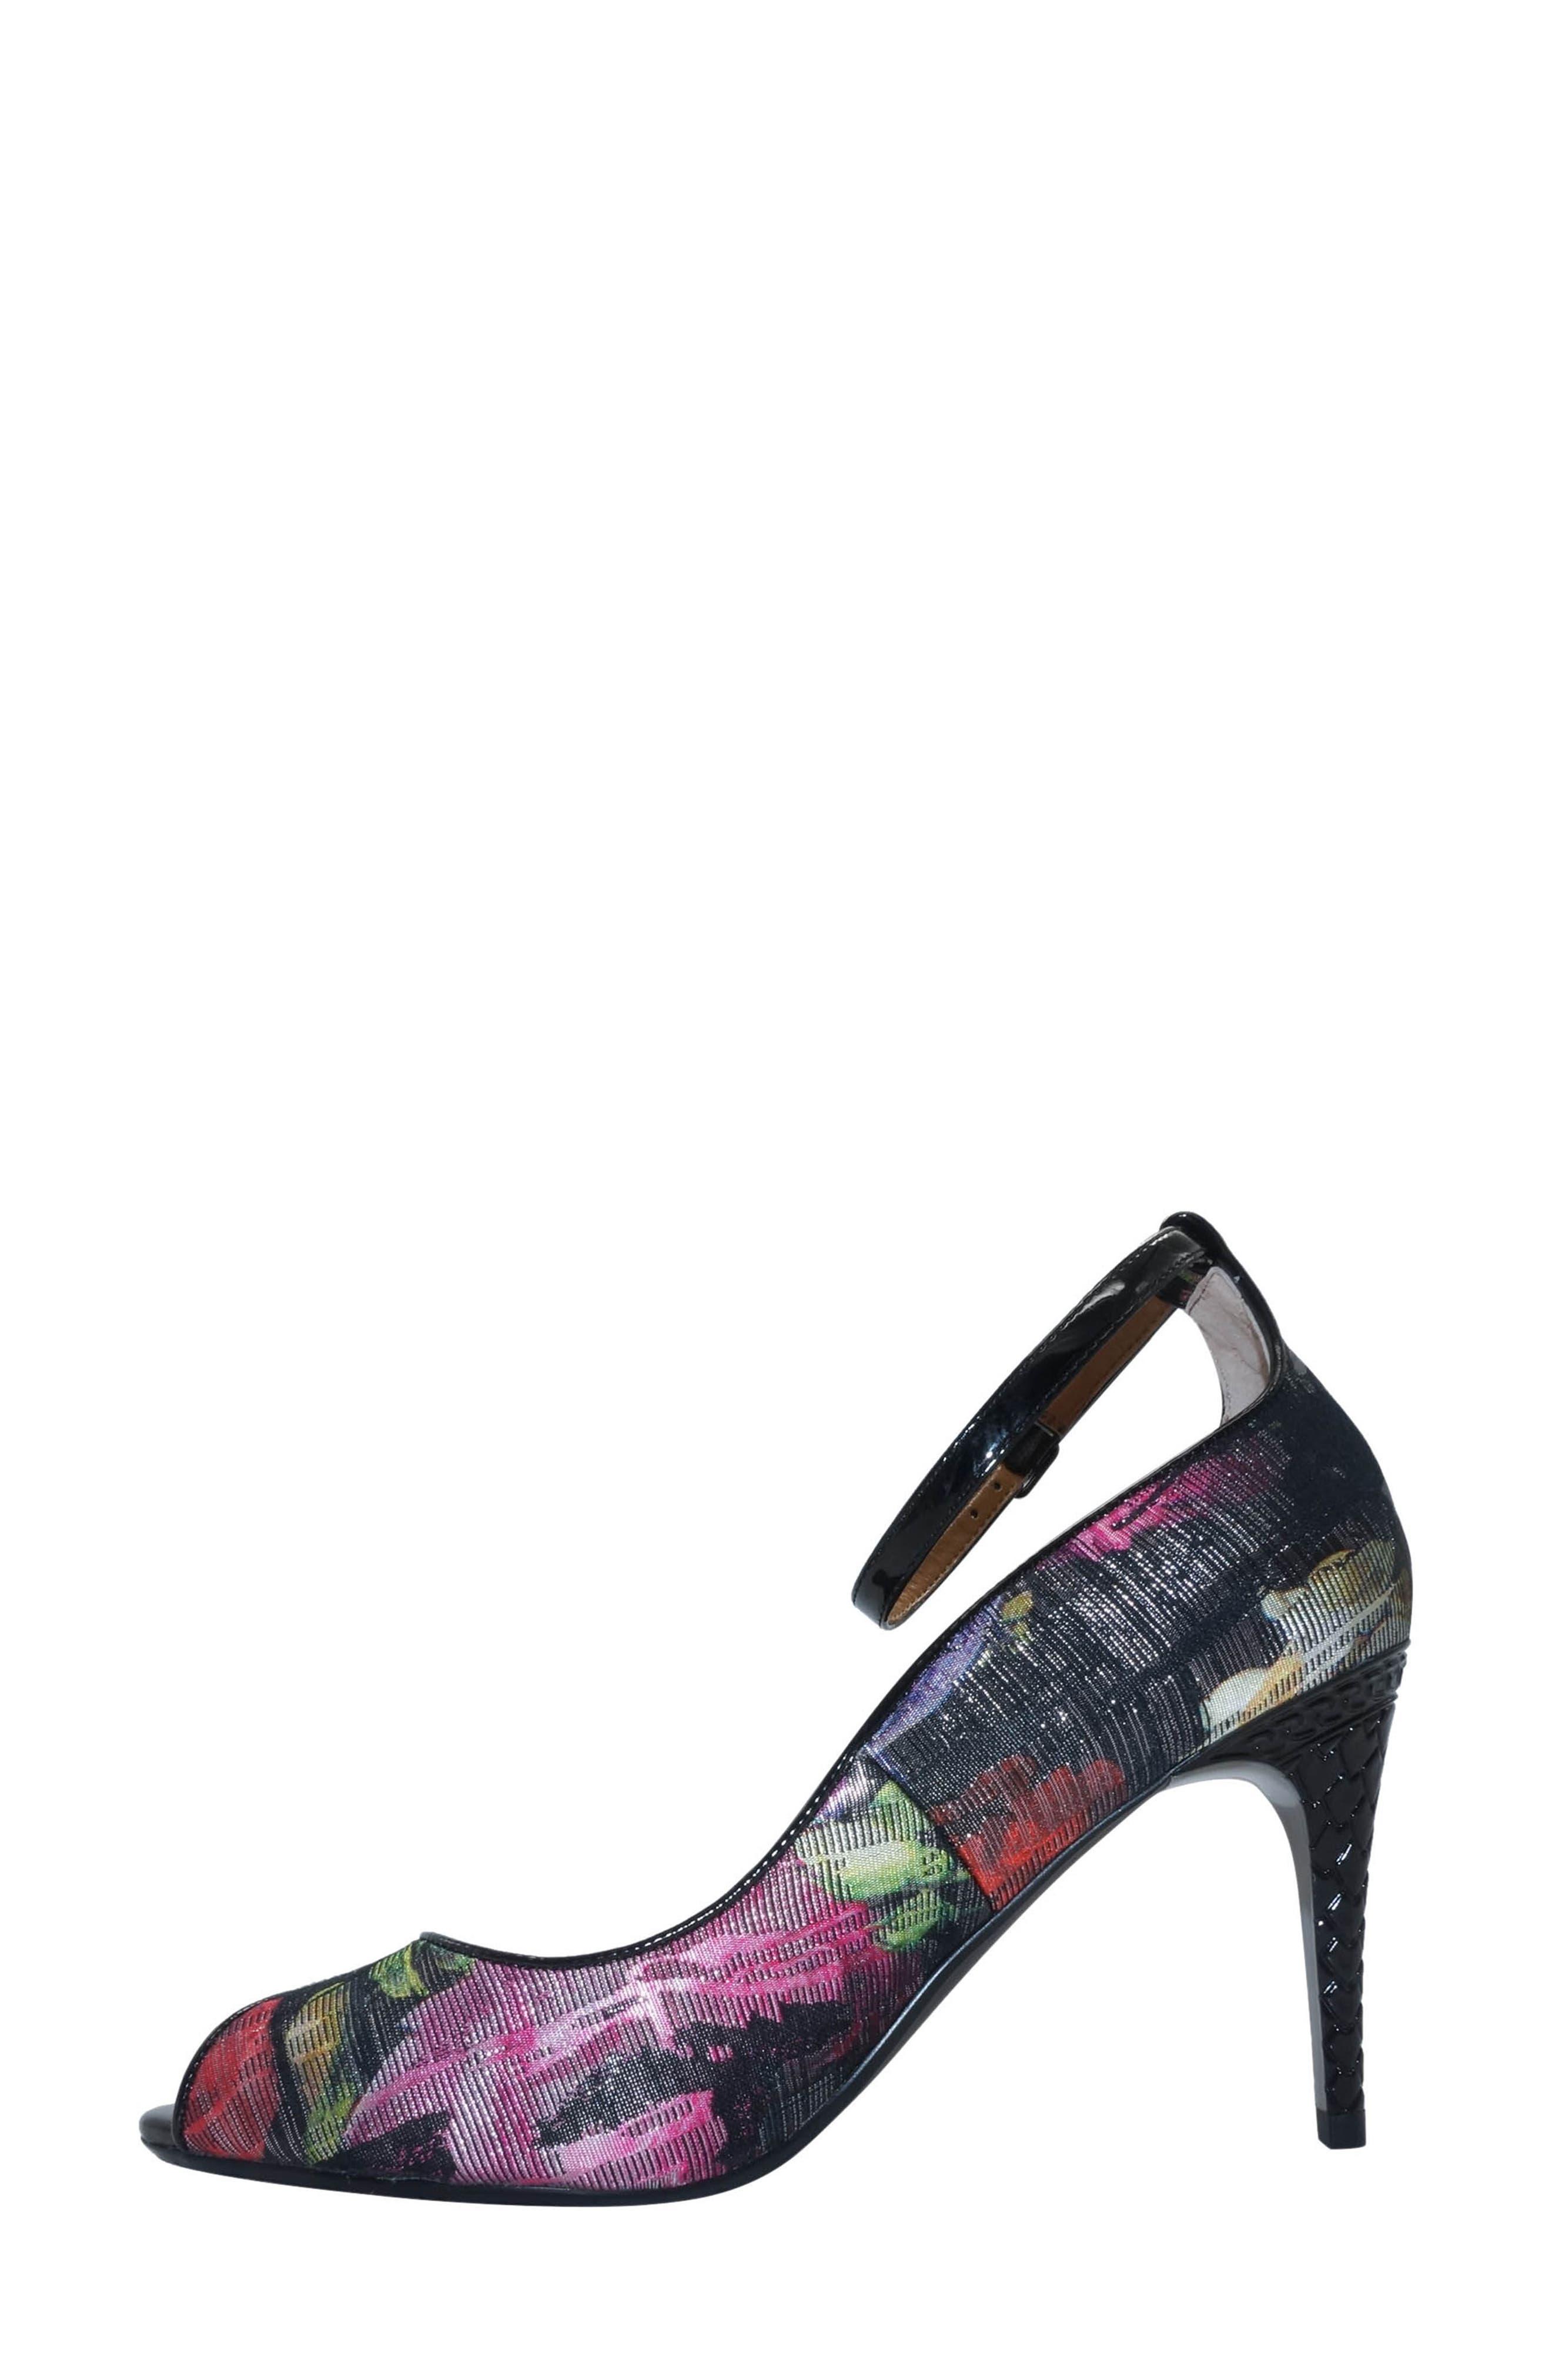 Raspalli Ankle Strap Peep Toe Pump,                             Alternate thumbnail 2, color,                             Red/ Black Multi